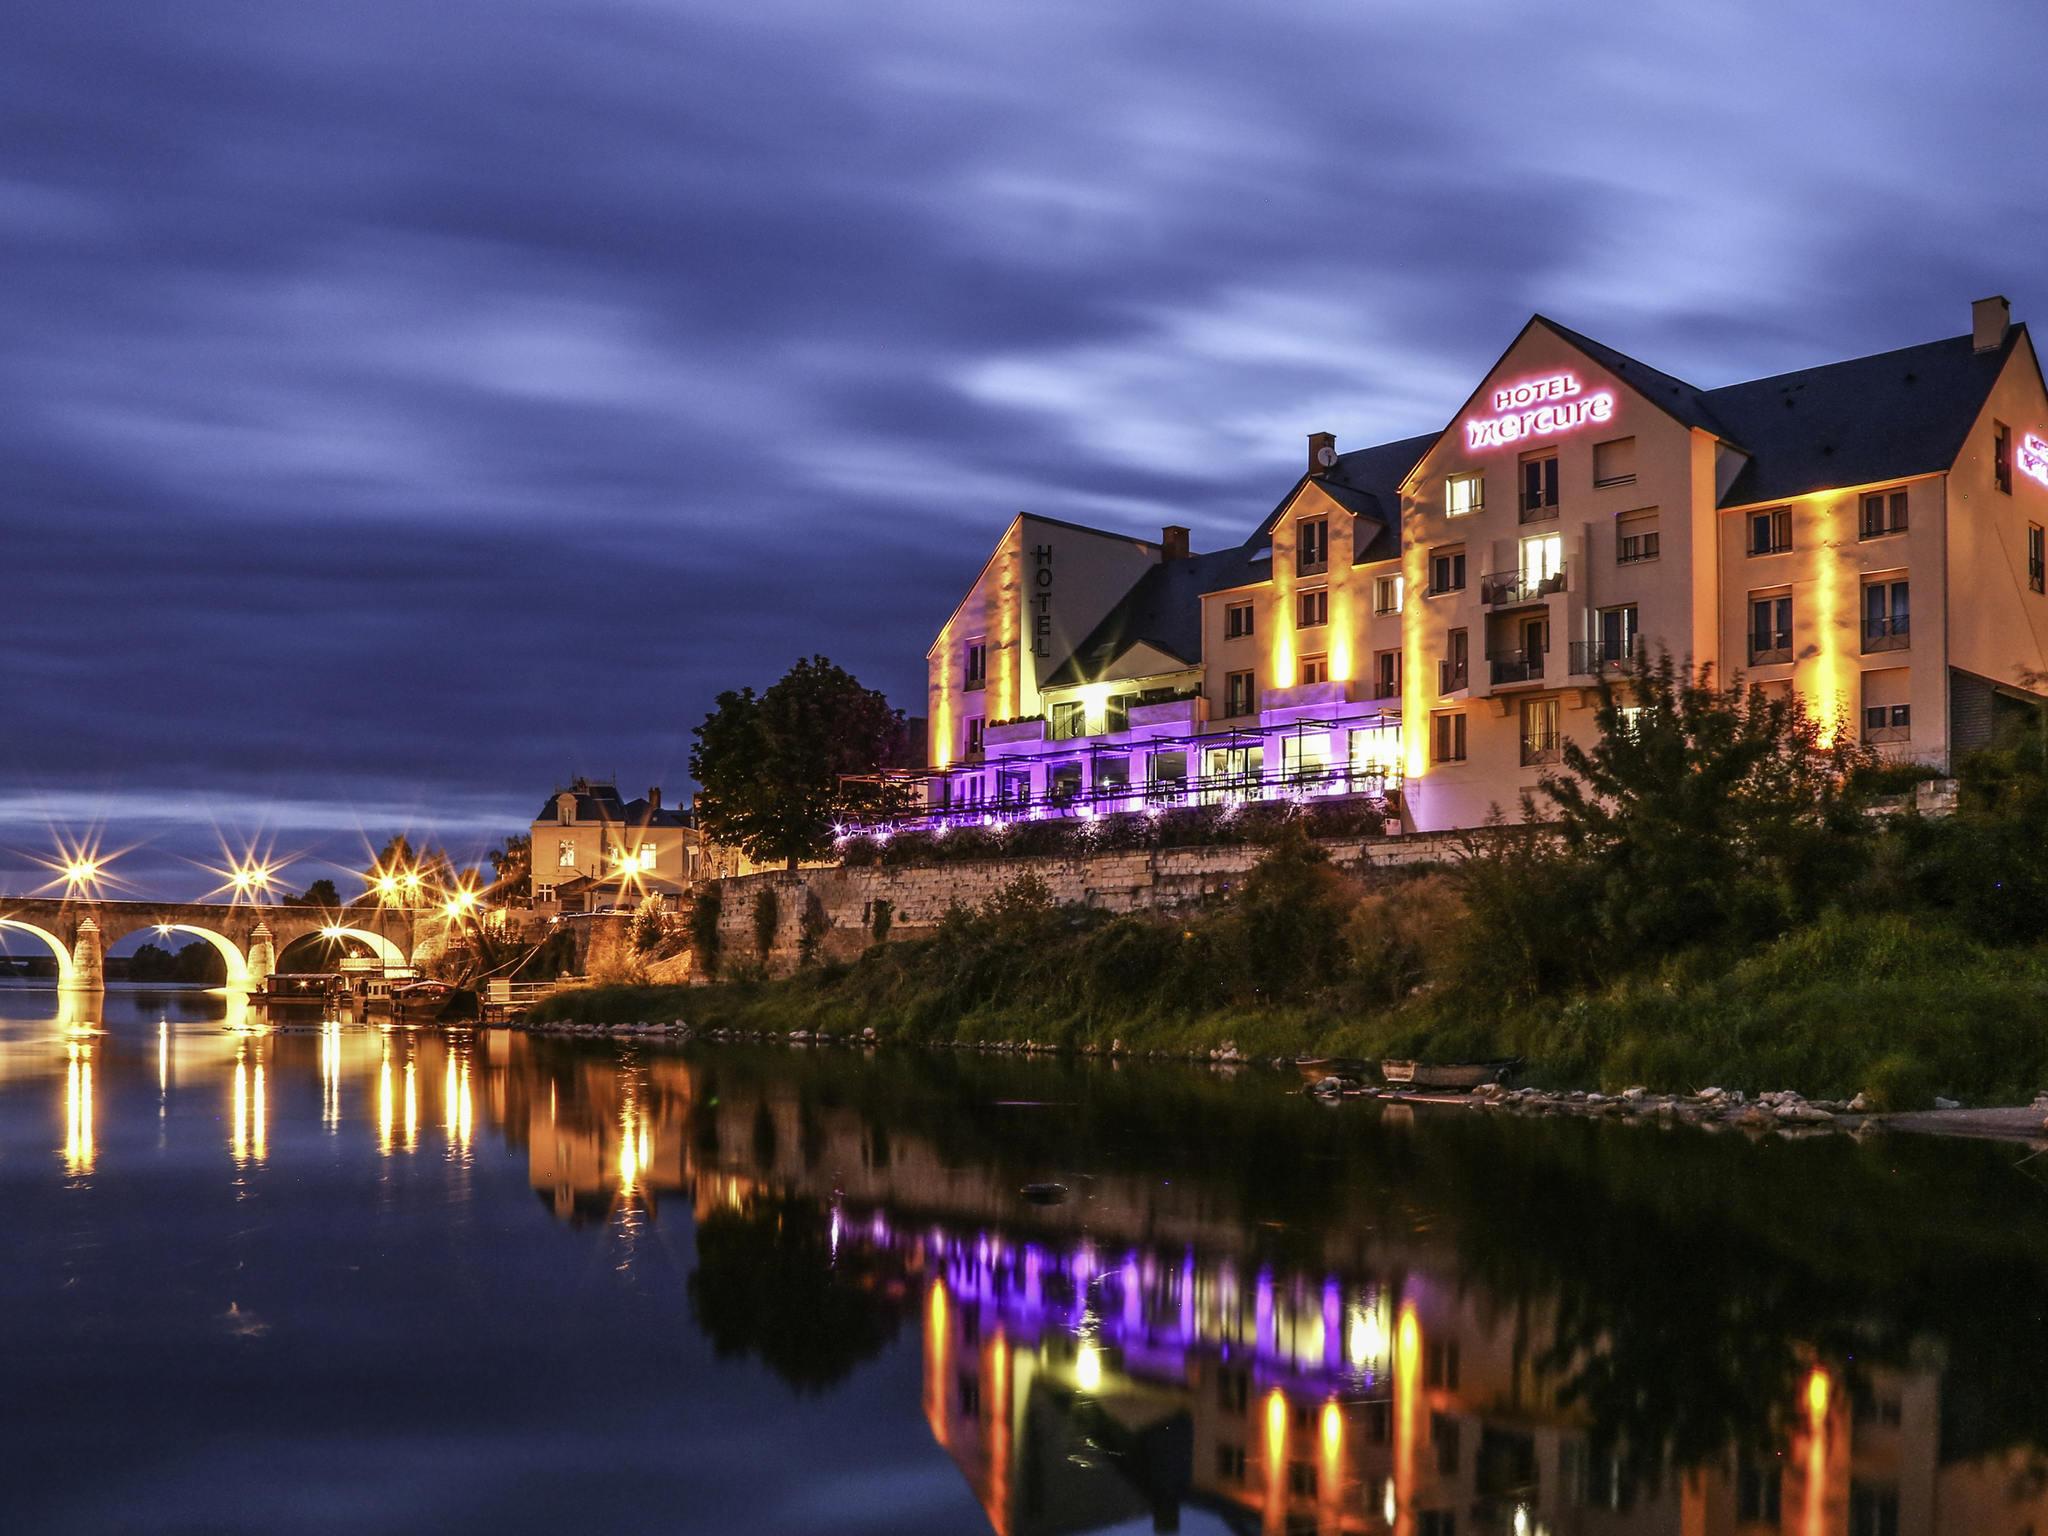 Hotel – Hotel Mercure Bords de Loire Saumur